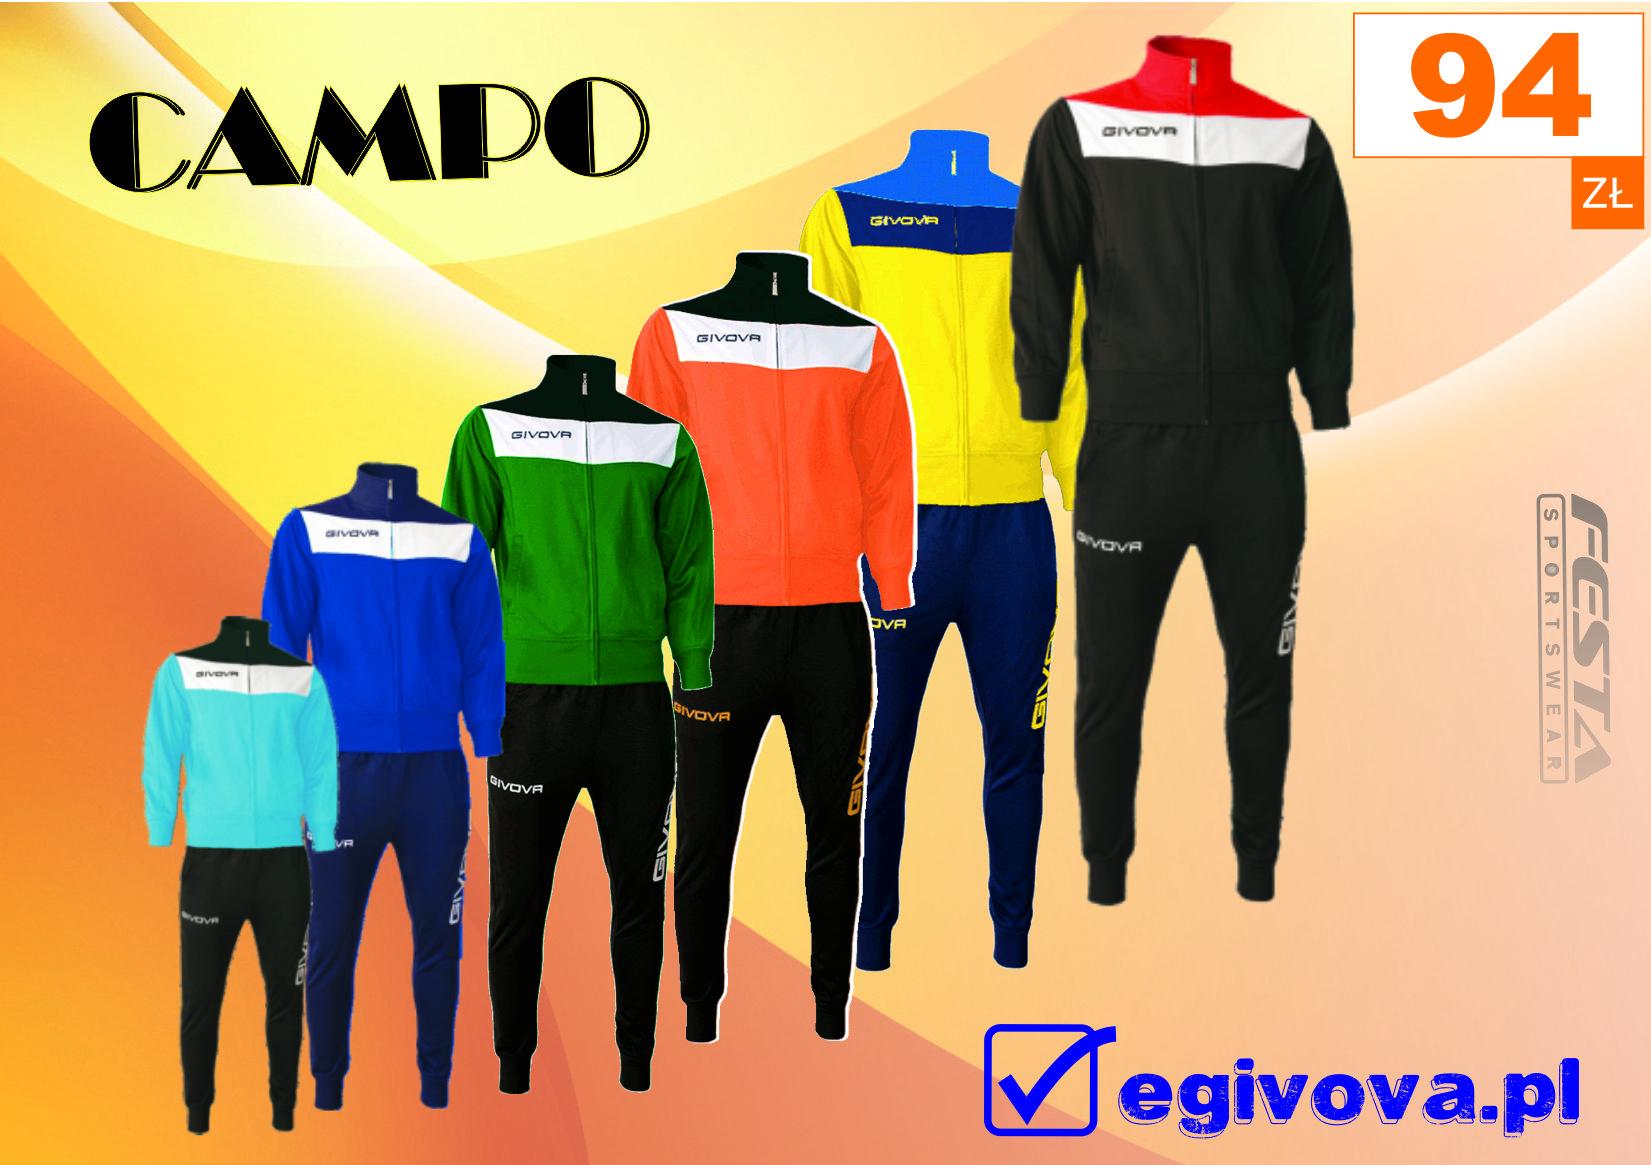 CAMPO 94 PLN